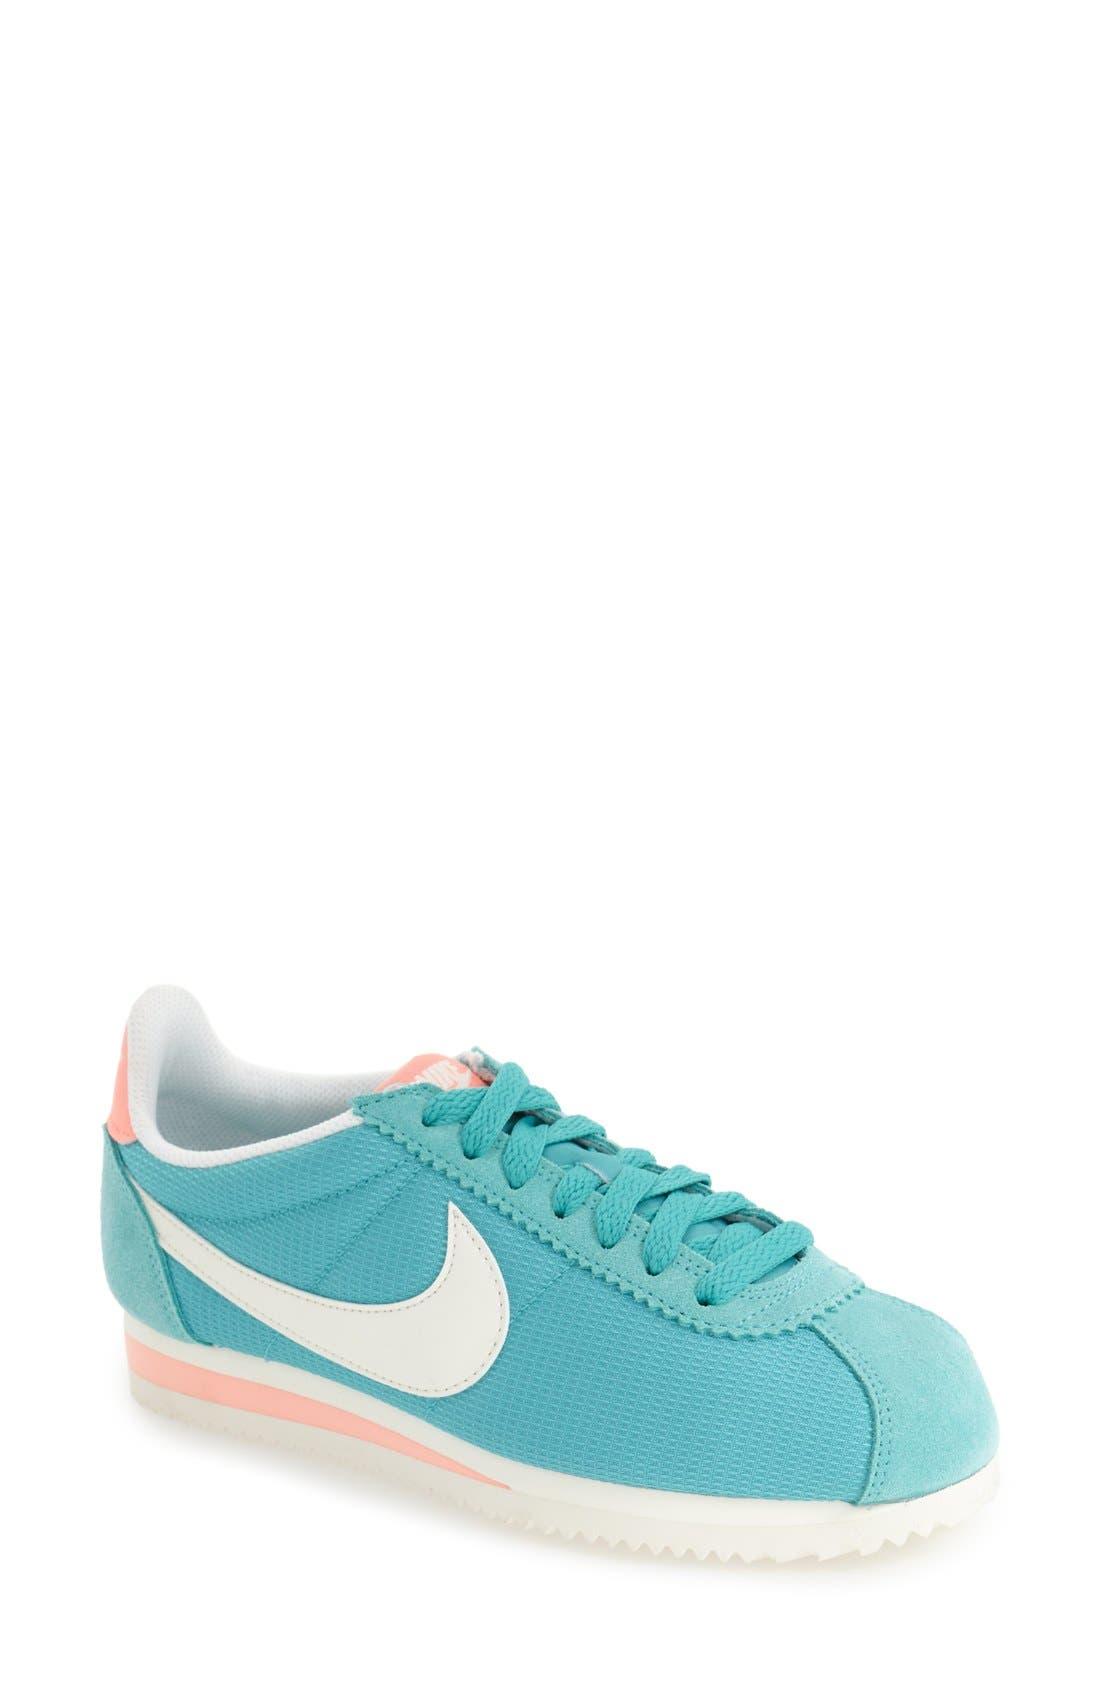 Alternate Image 1 Selected - Nike Classic Cortez Sneaker (Women)